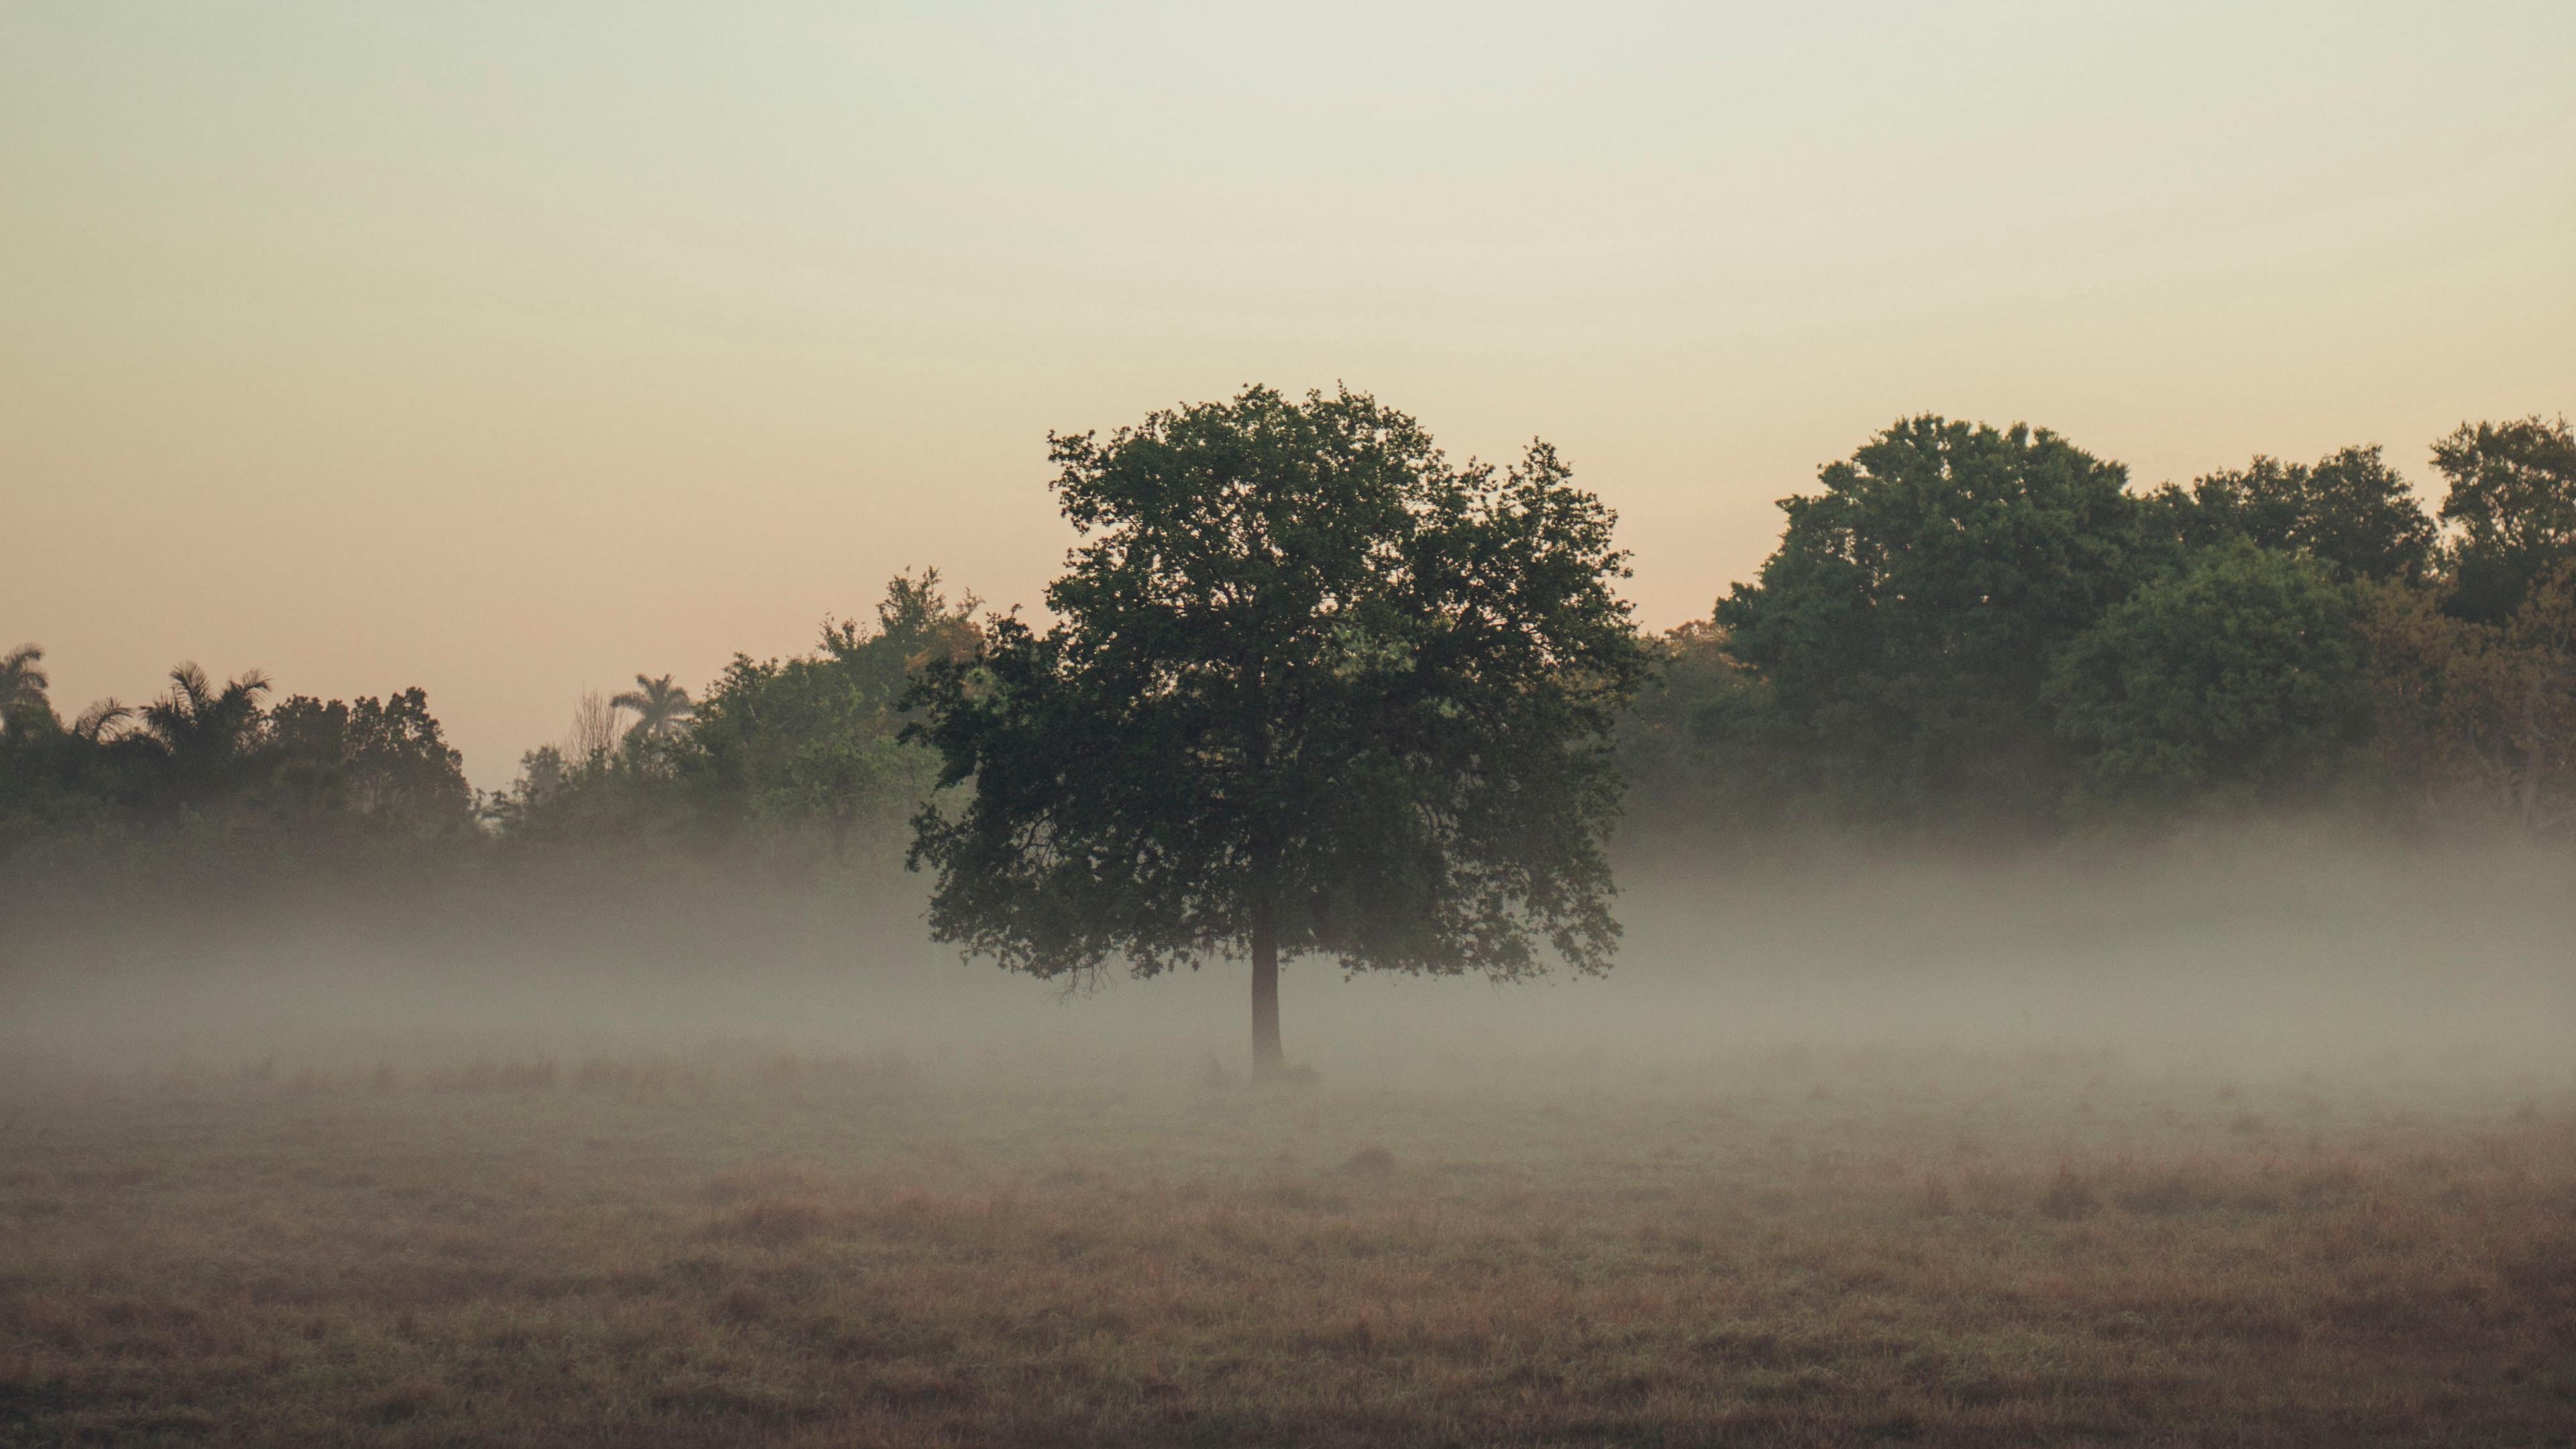 trees fog field 4k 1541116809 - trees, fog, field 4k - Trees, fog, Field